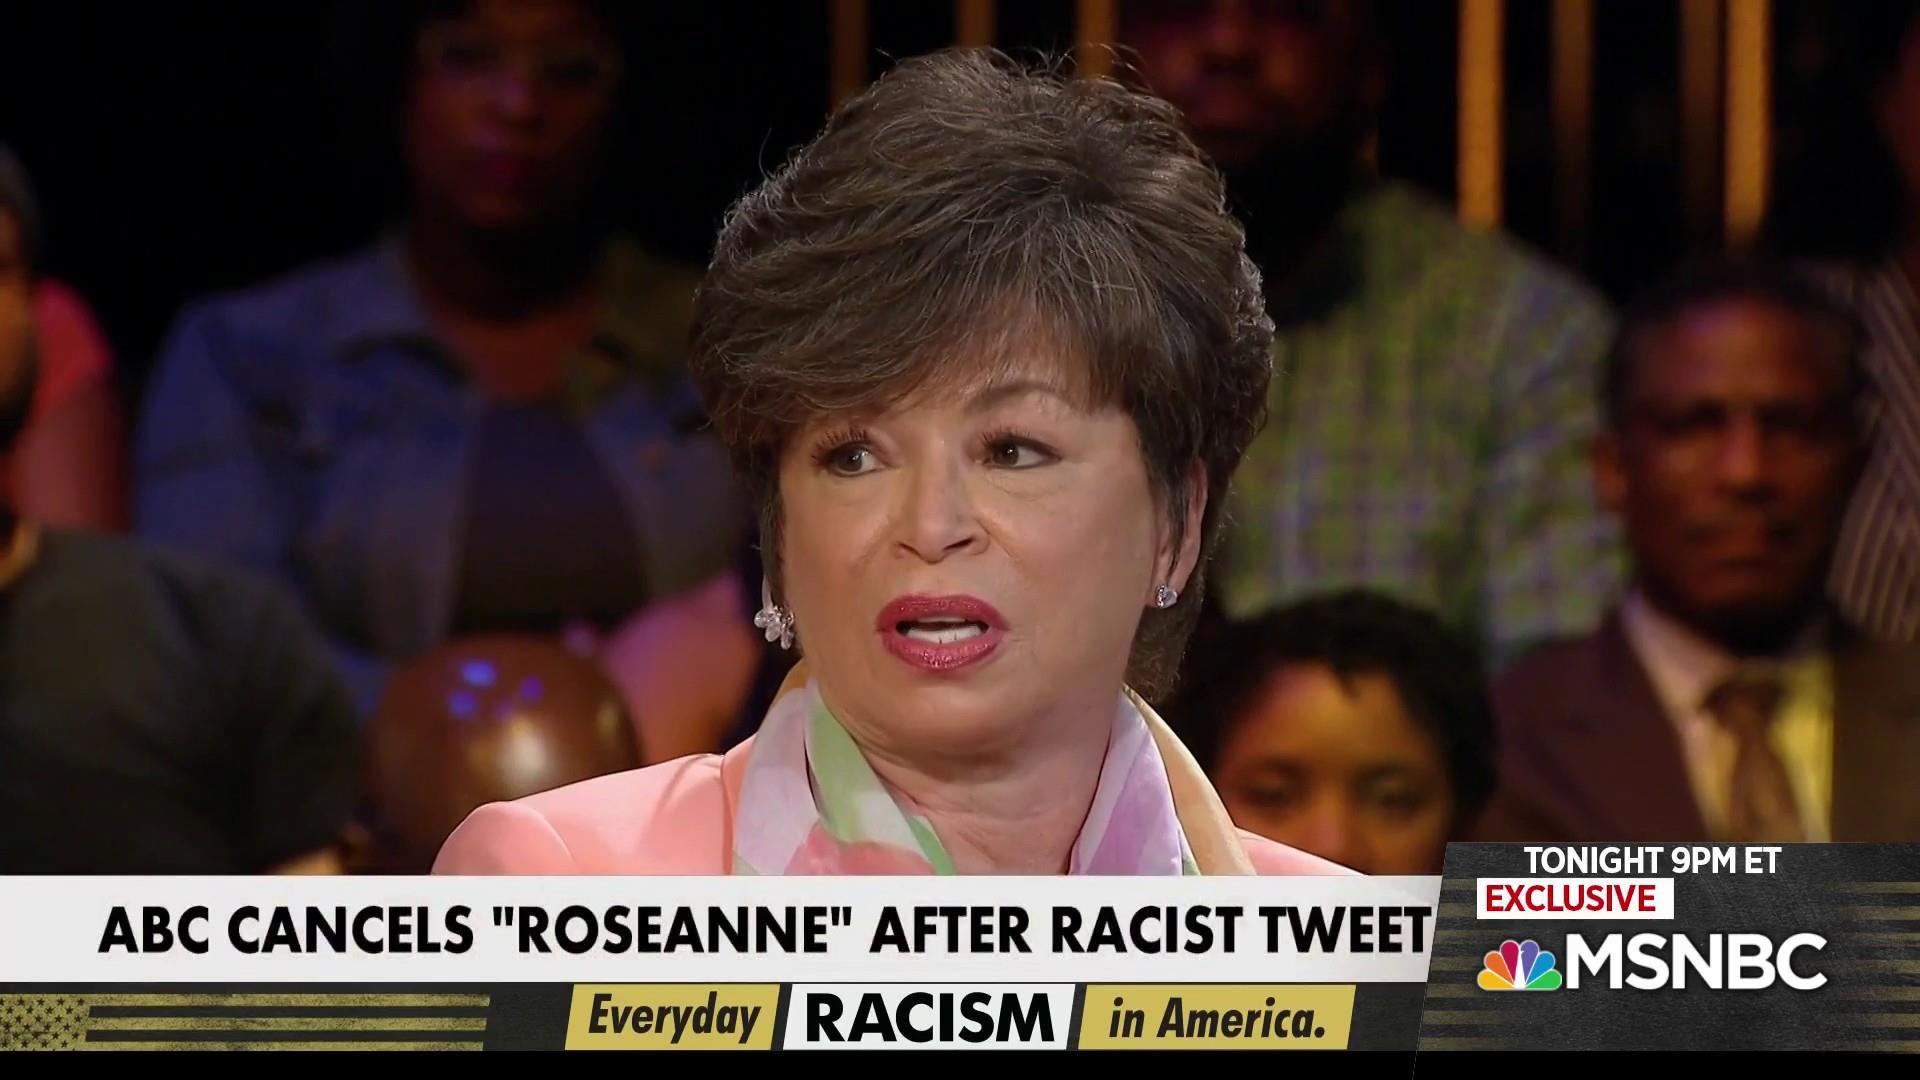 Rev. Sharpton: Roseanne tweet shows Trump 'normalizing' racism